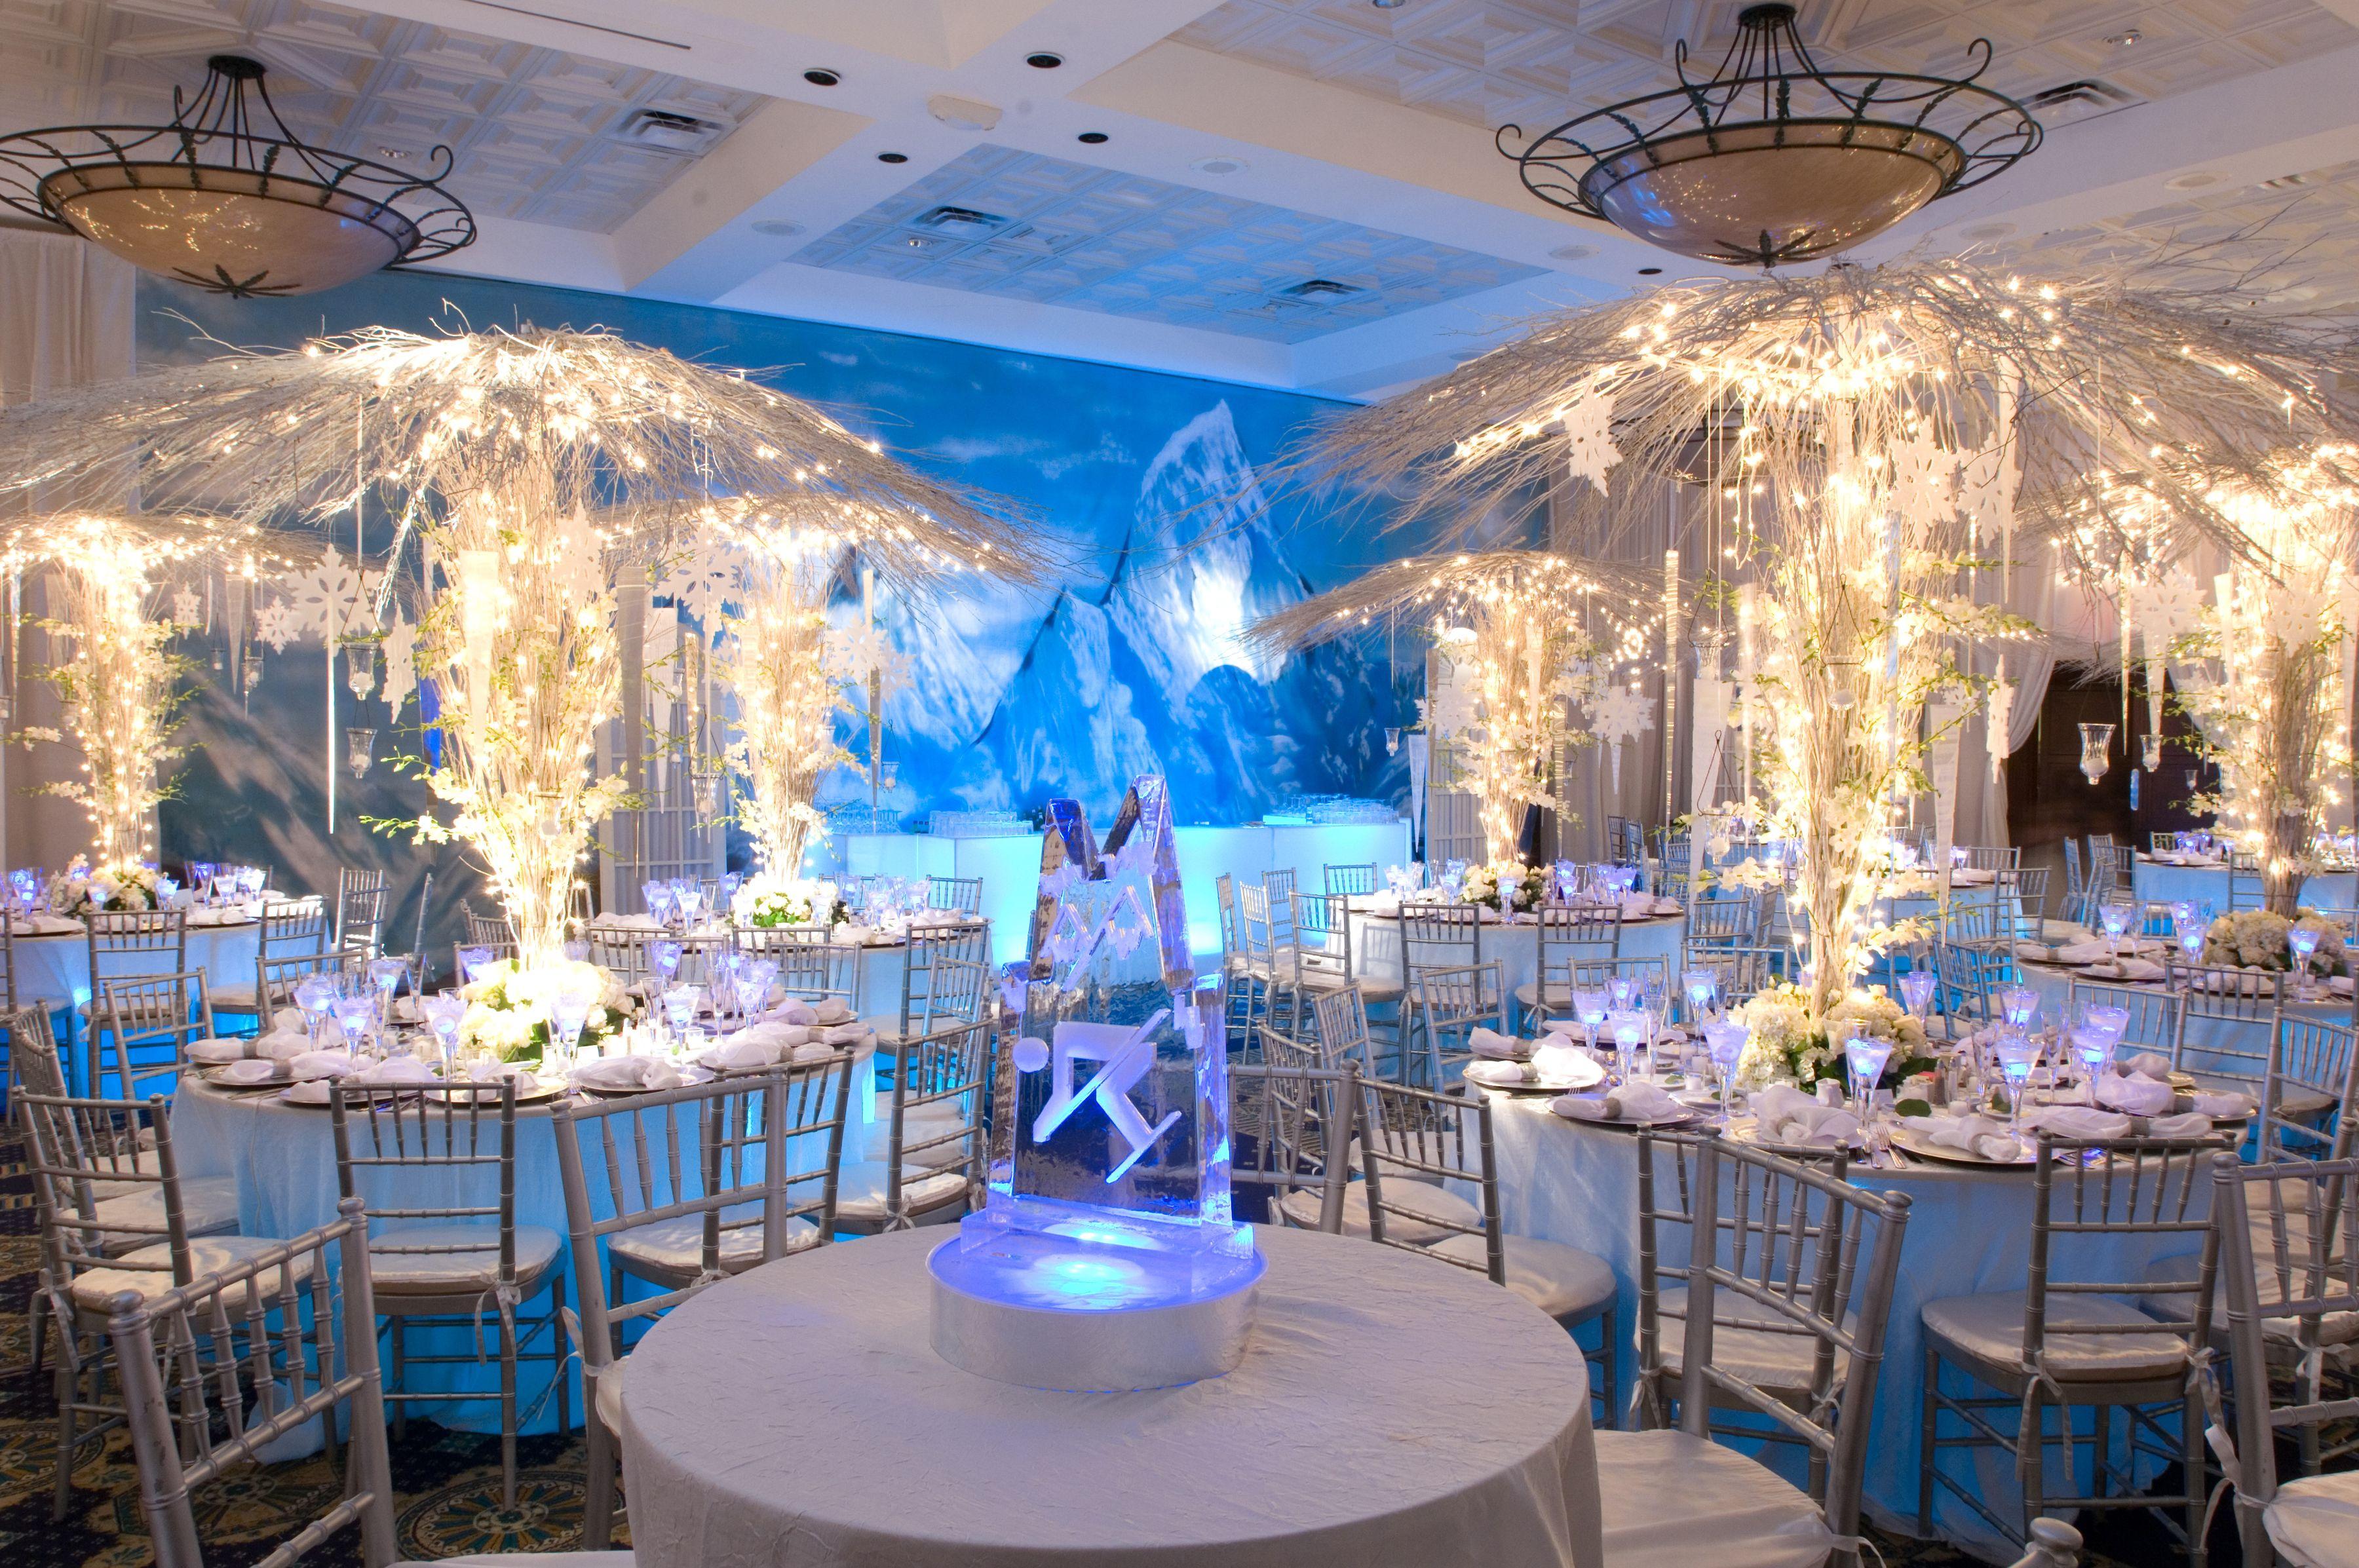 Backdrop Behind White Light Up Bar. Light Up Ice